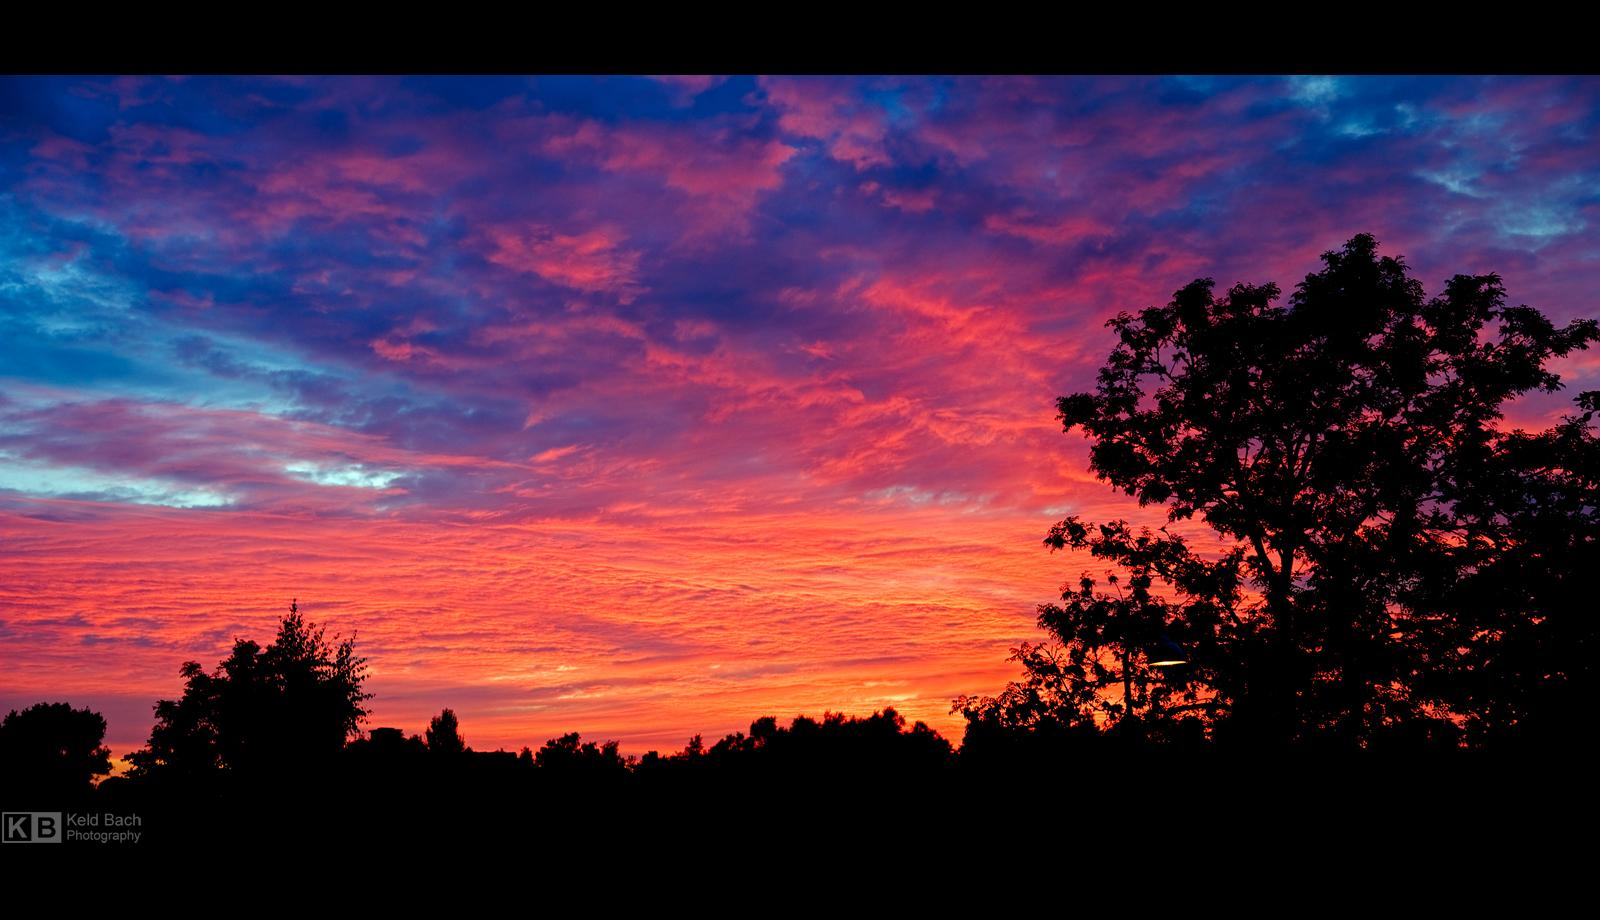 Sunset in August by KeldBach